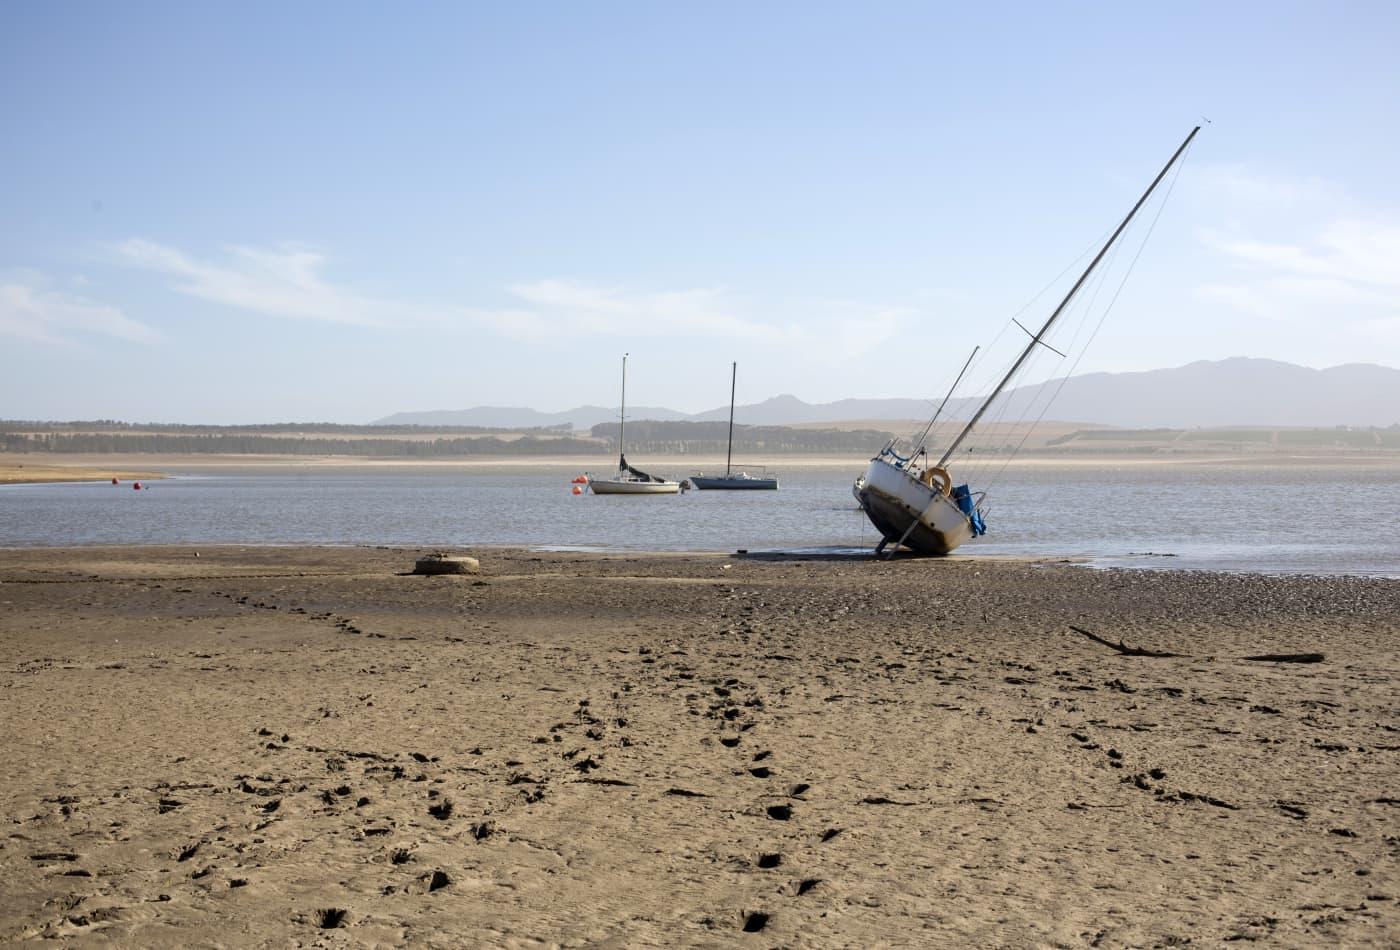 South Africa's Cape Town drought: Economic impact is uncertain